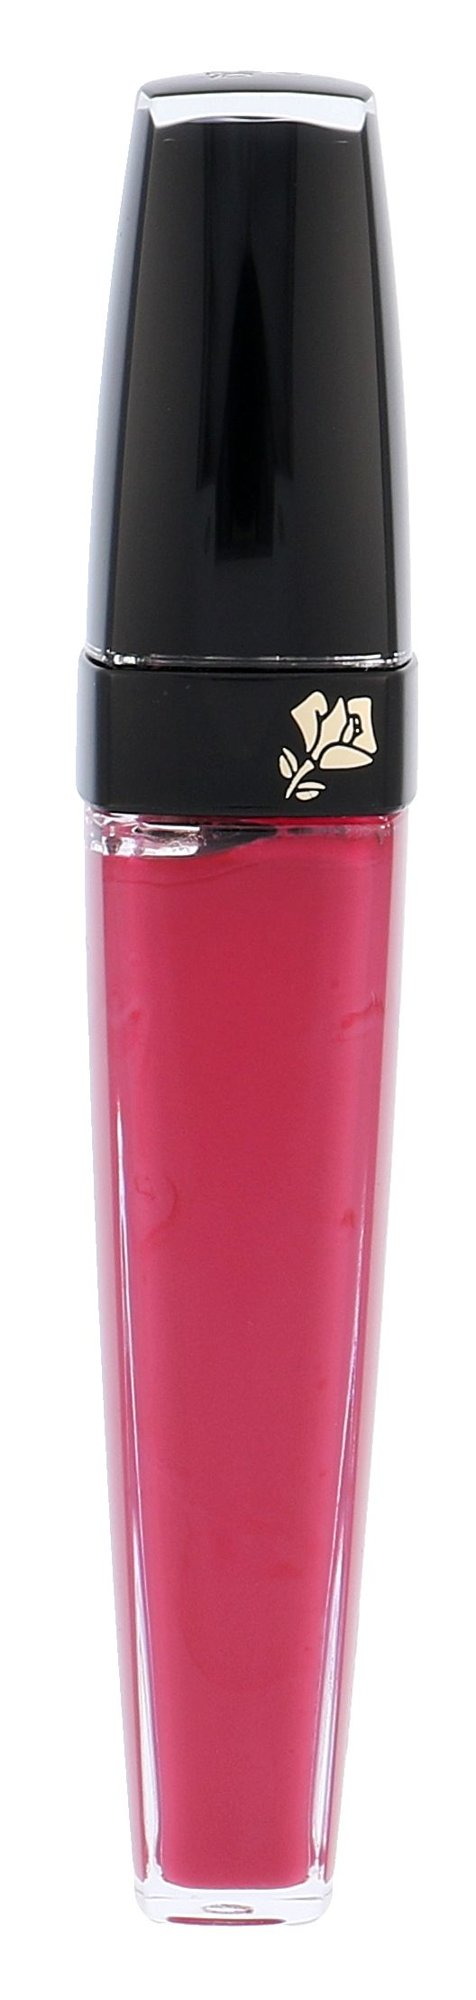 Lancôme L Absolu Cosmetic 6ml 385 Velours De Pourpre Velours